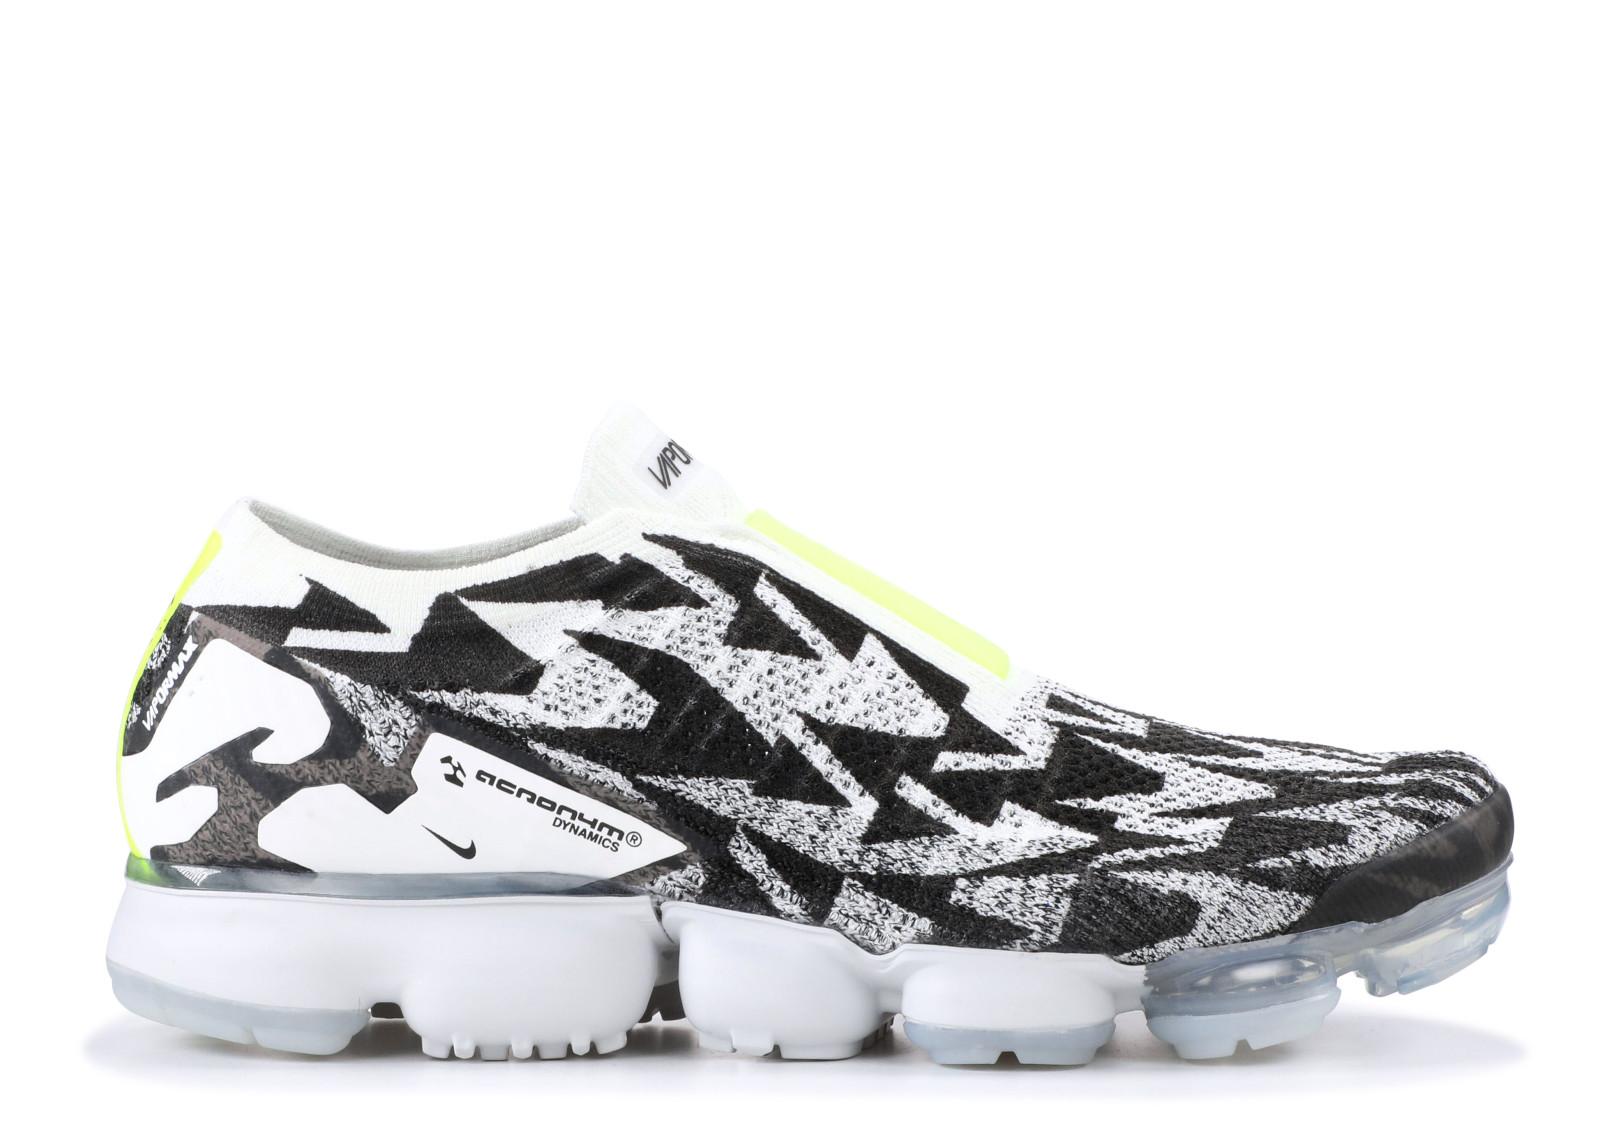 2d167a9f98270 Nike Air VaporMax Moc 2 Acronym Light Bone - 0